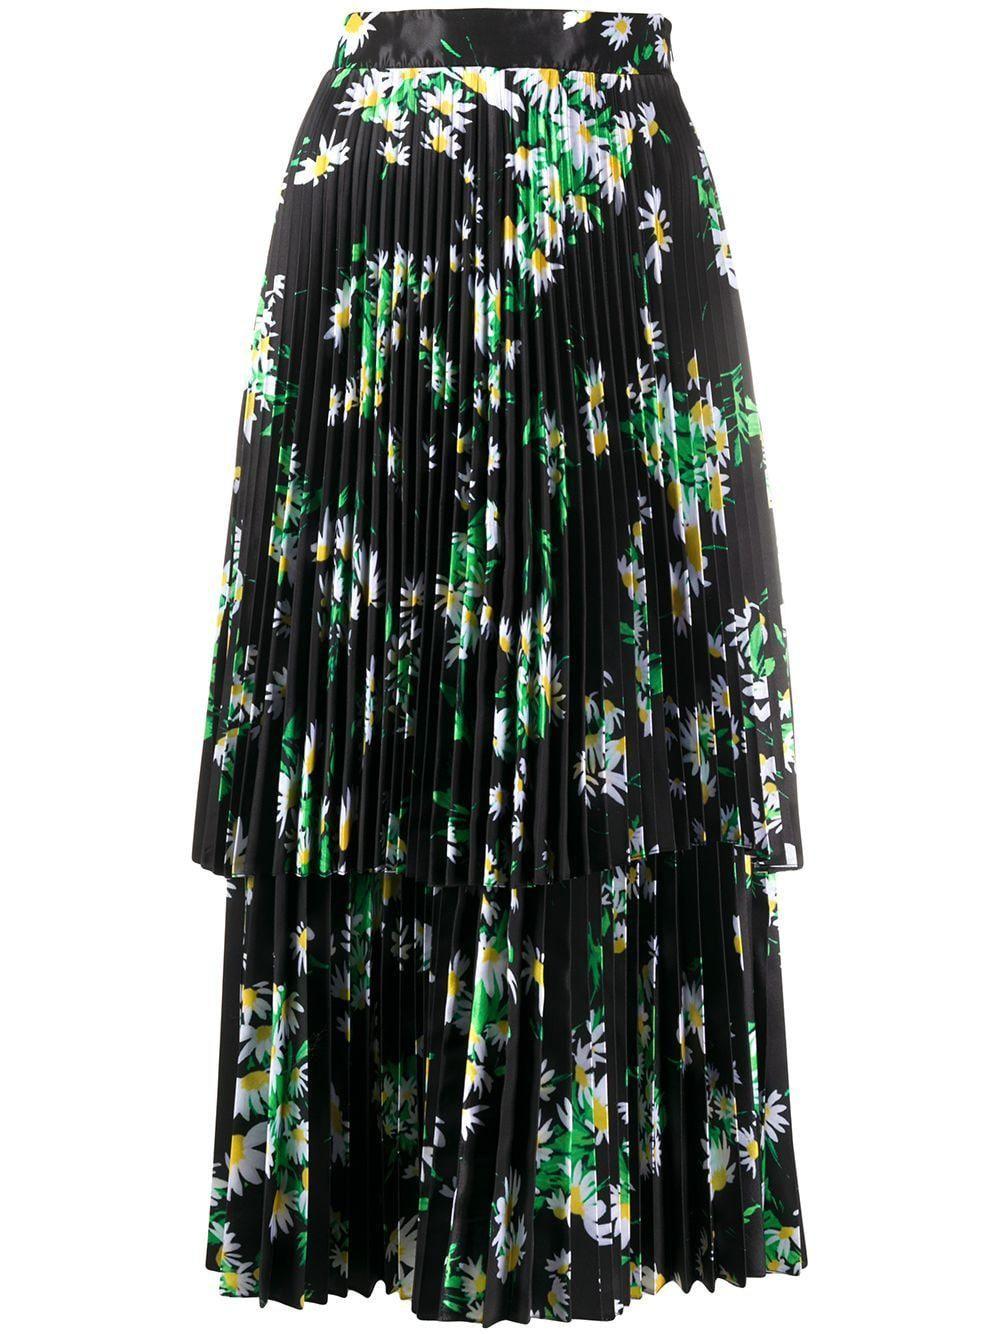 richard quinn daisy print midi dress